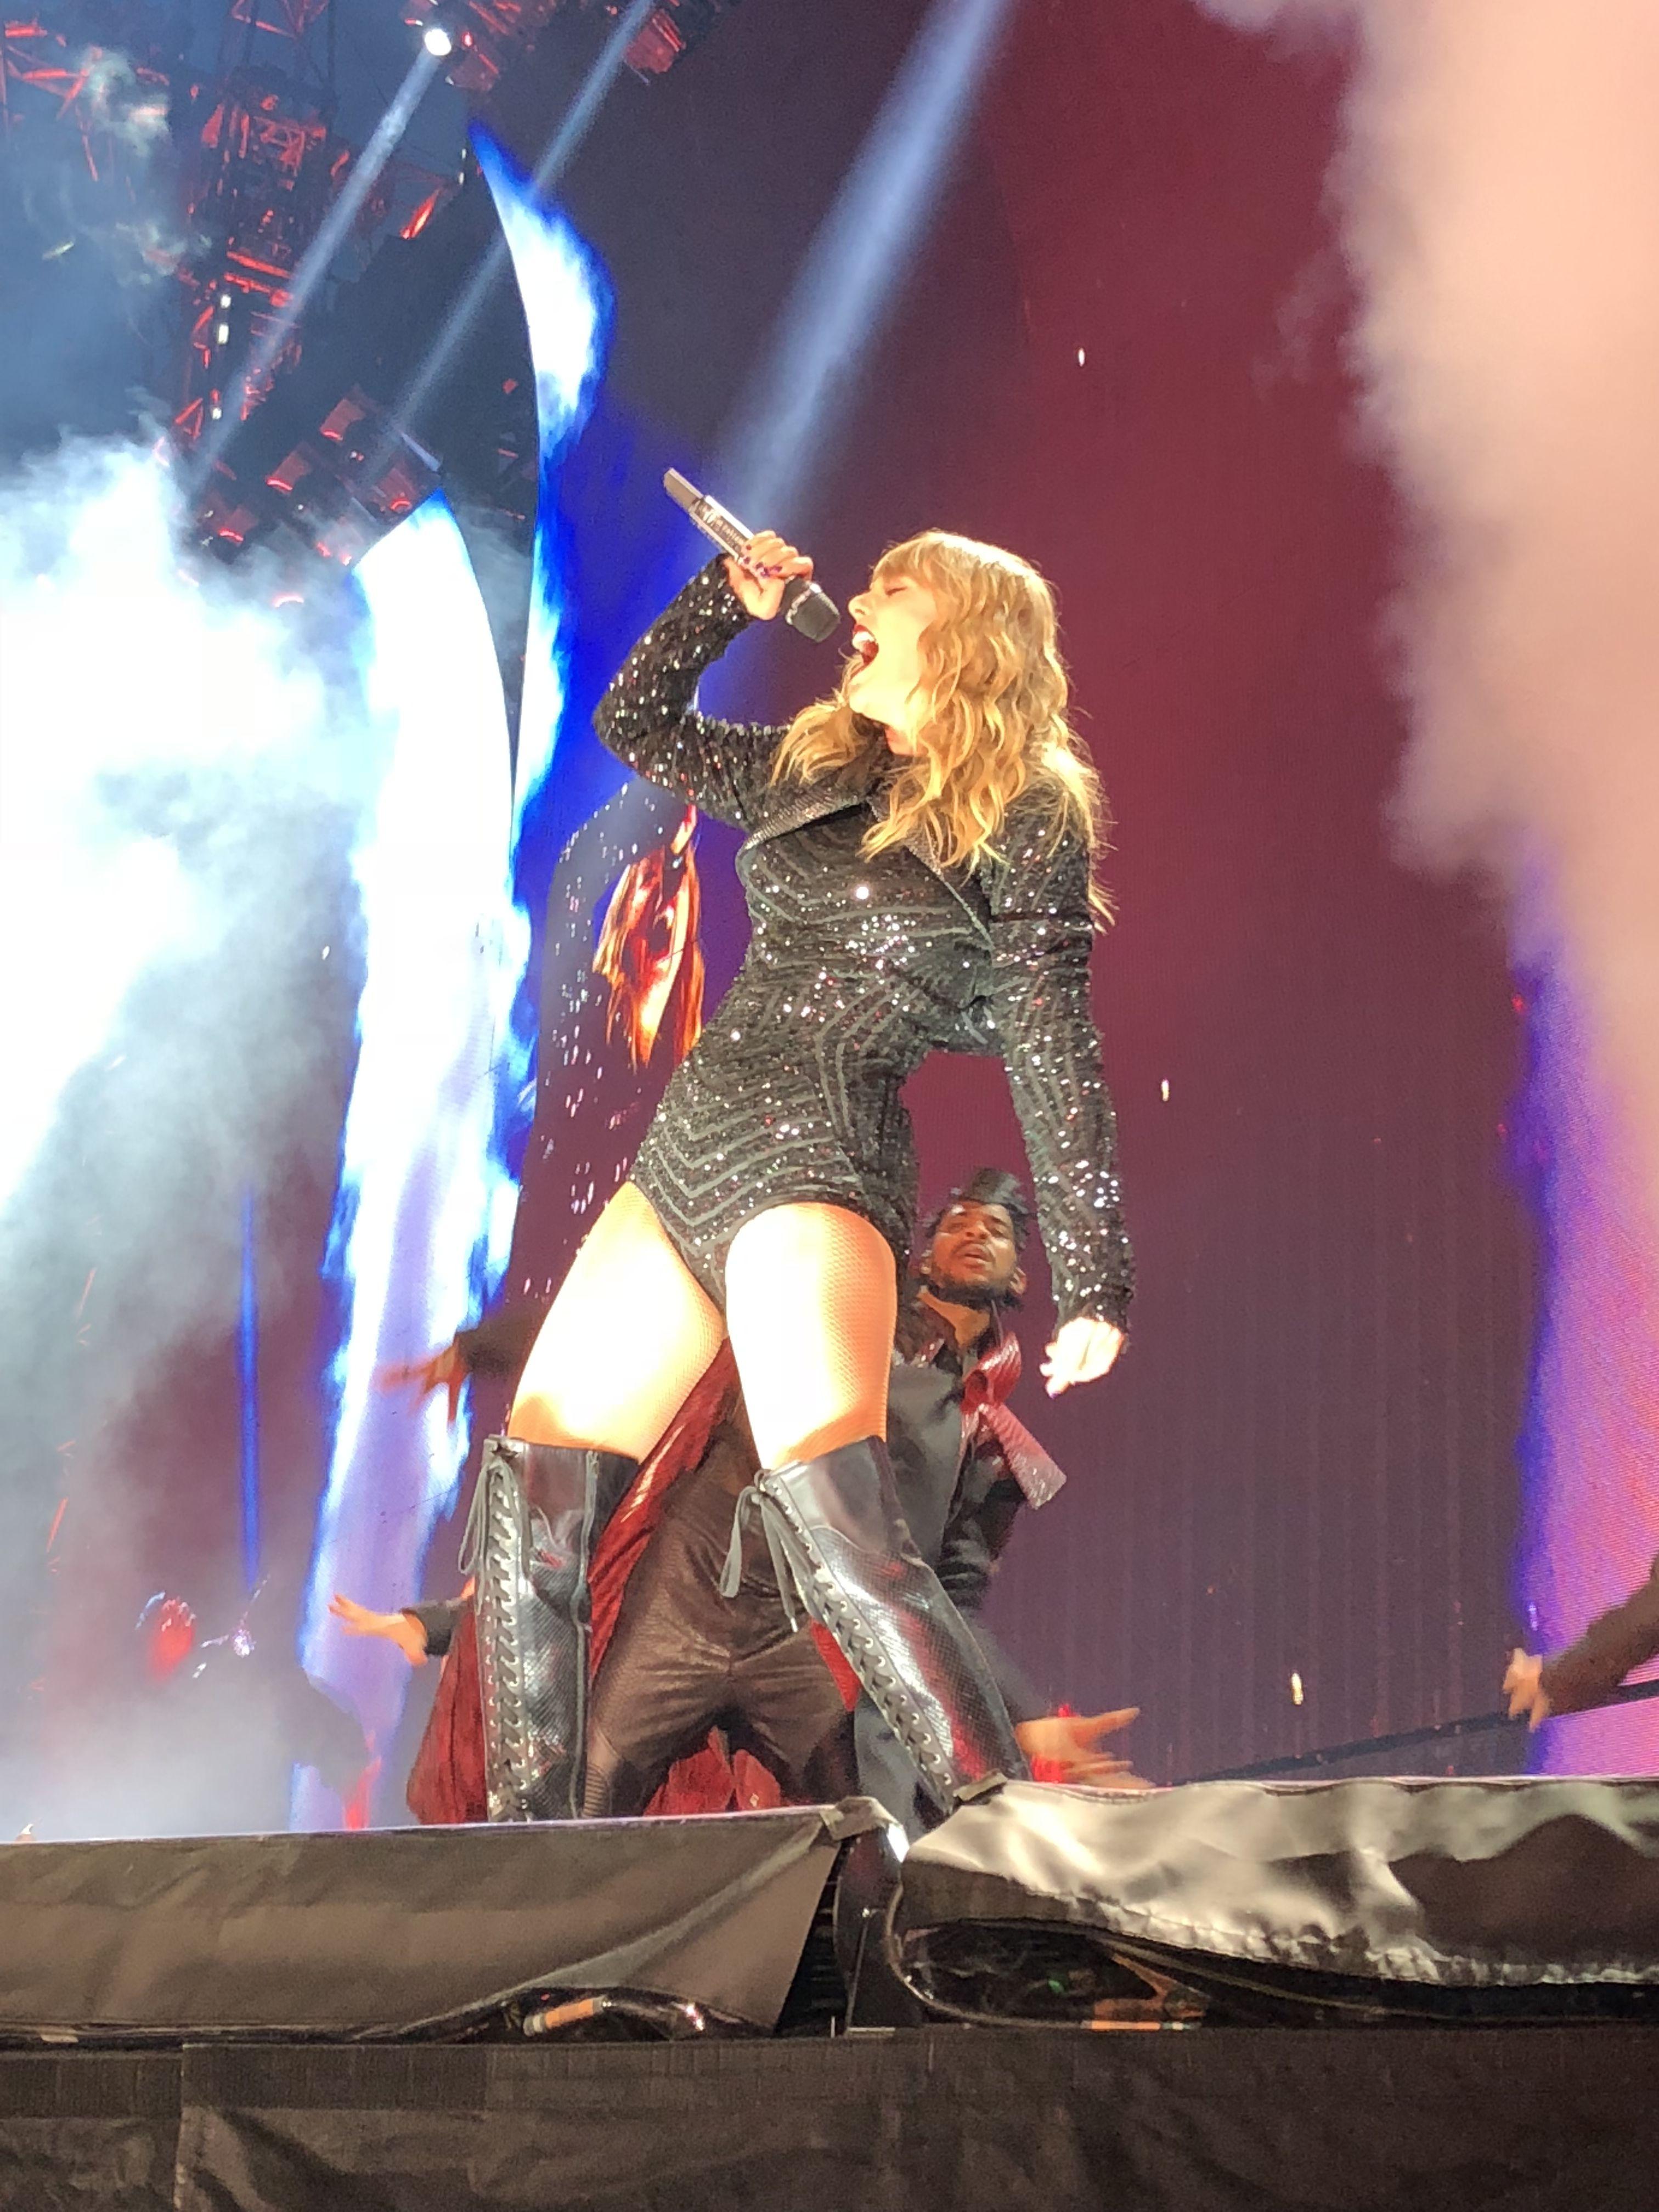 Reputation Stadium Tour Washington D C July 10th Campbellhuber Taylor Swift Songs Taylor Swift Celebrities